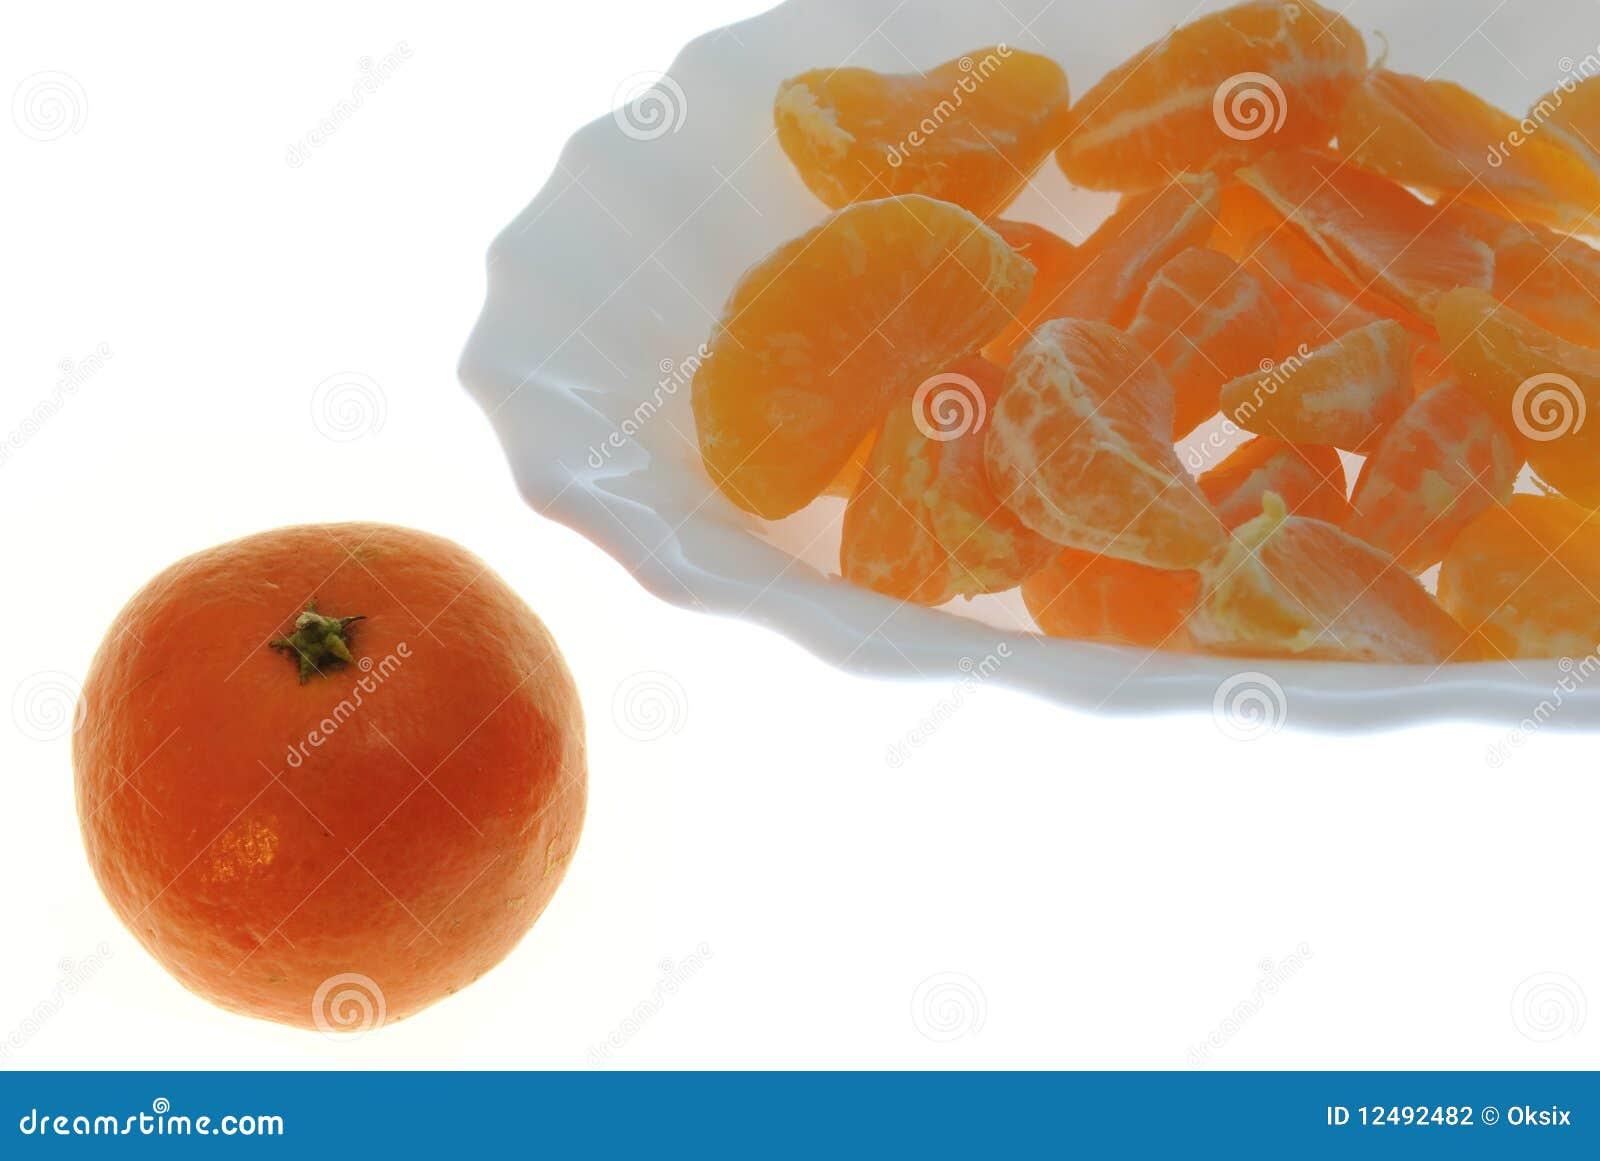 Groups Of Segments A Tangerine